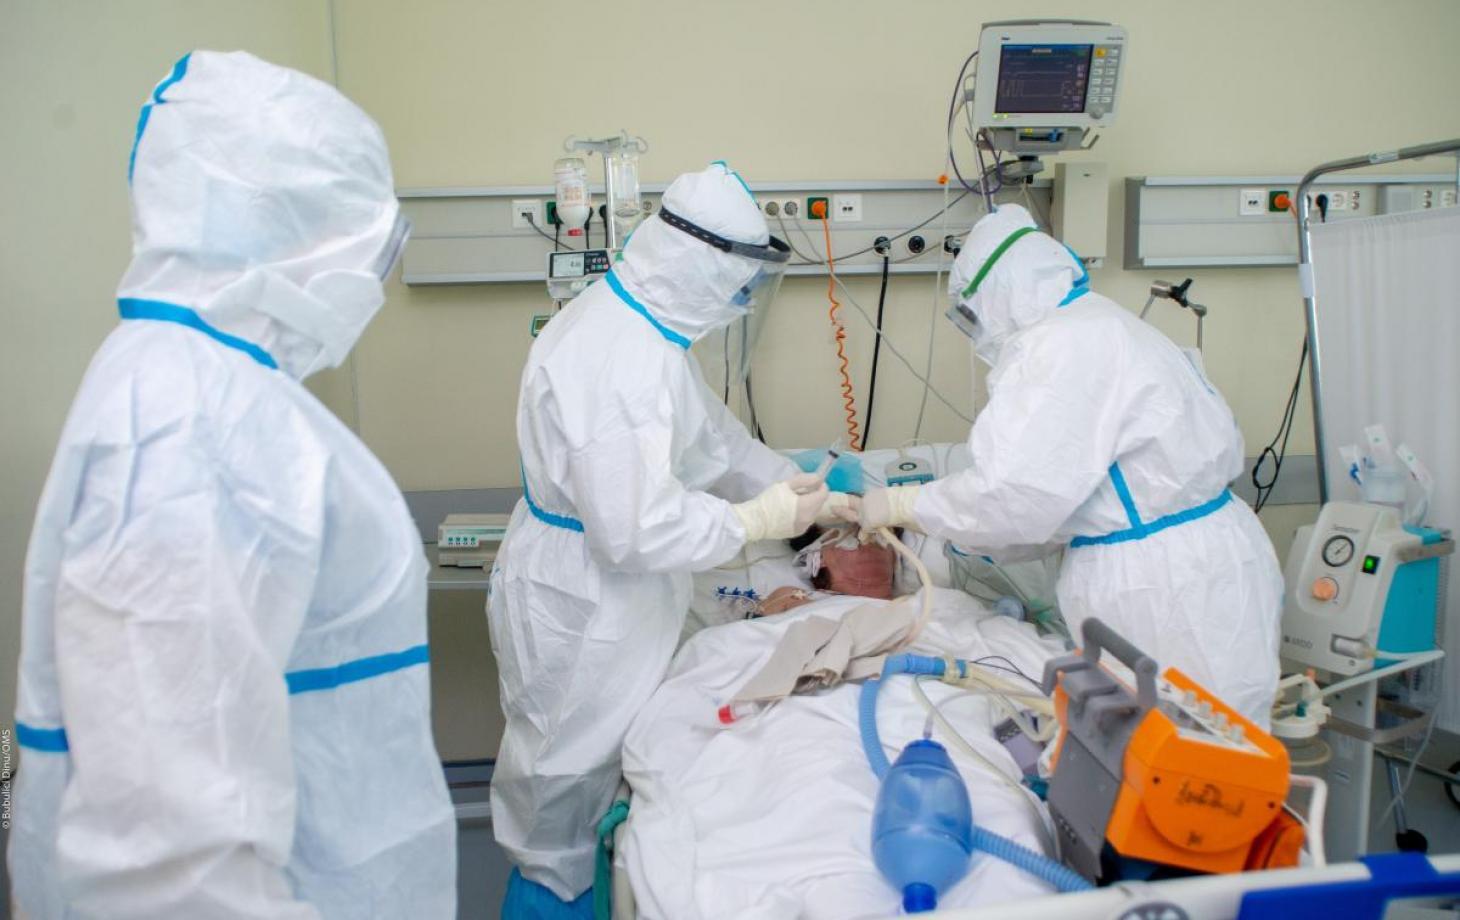 В Молдове от коронавируса скончался еще один врач. За все время эпидемии в стране умерли 24 медработника